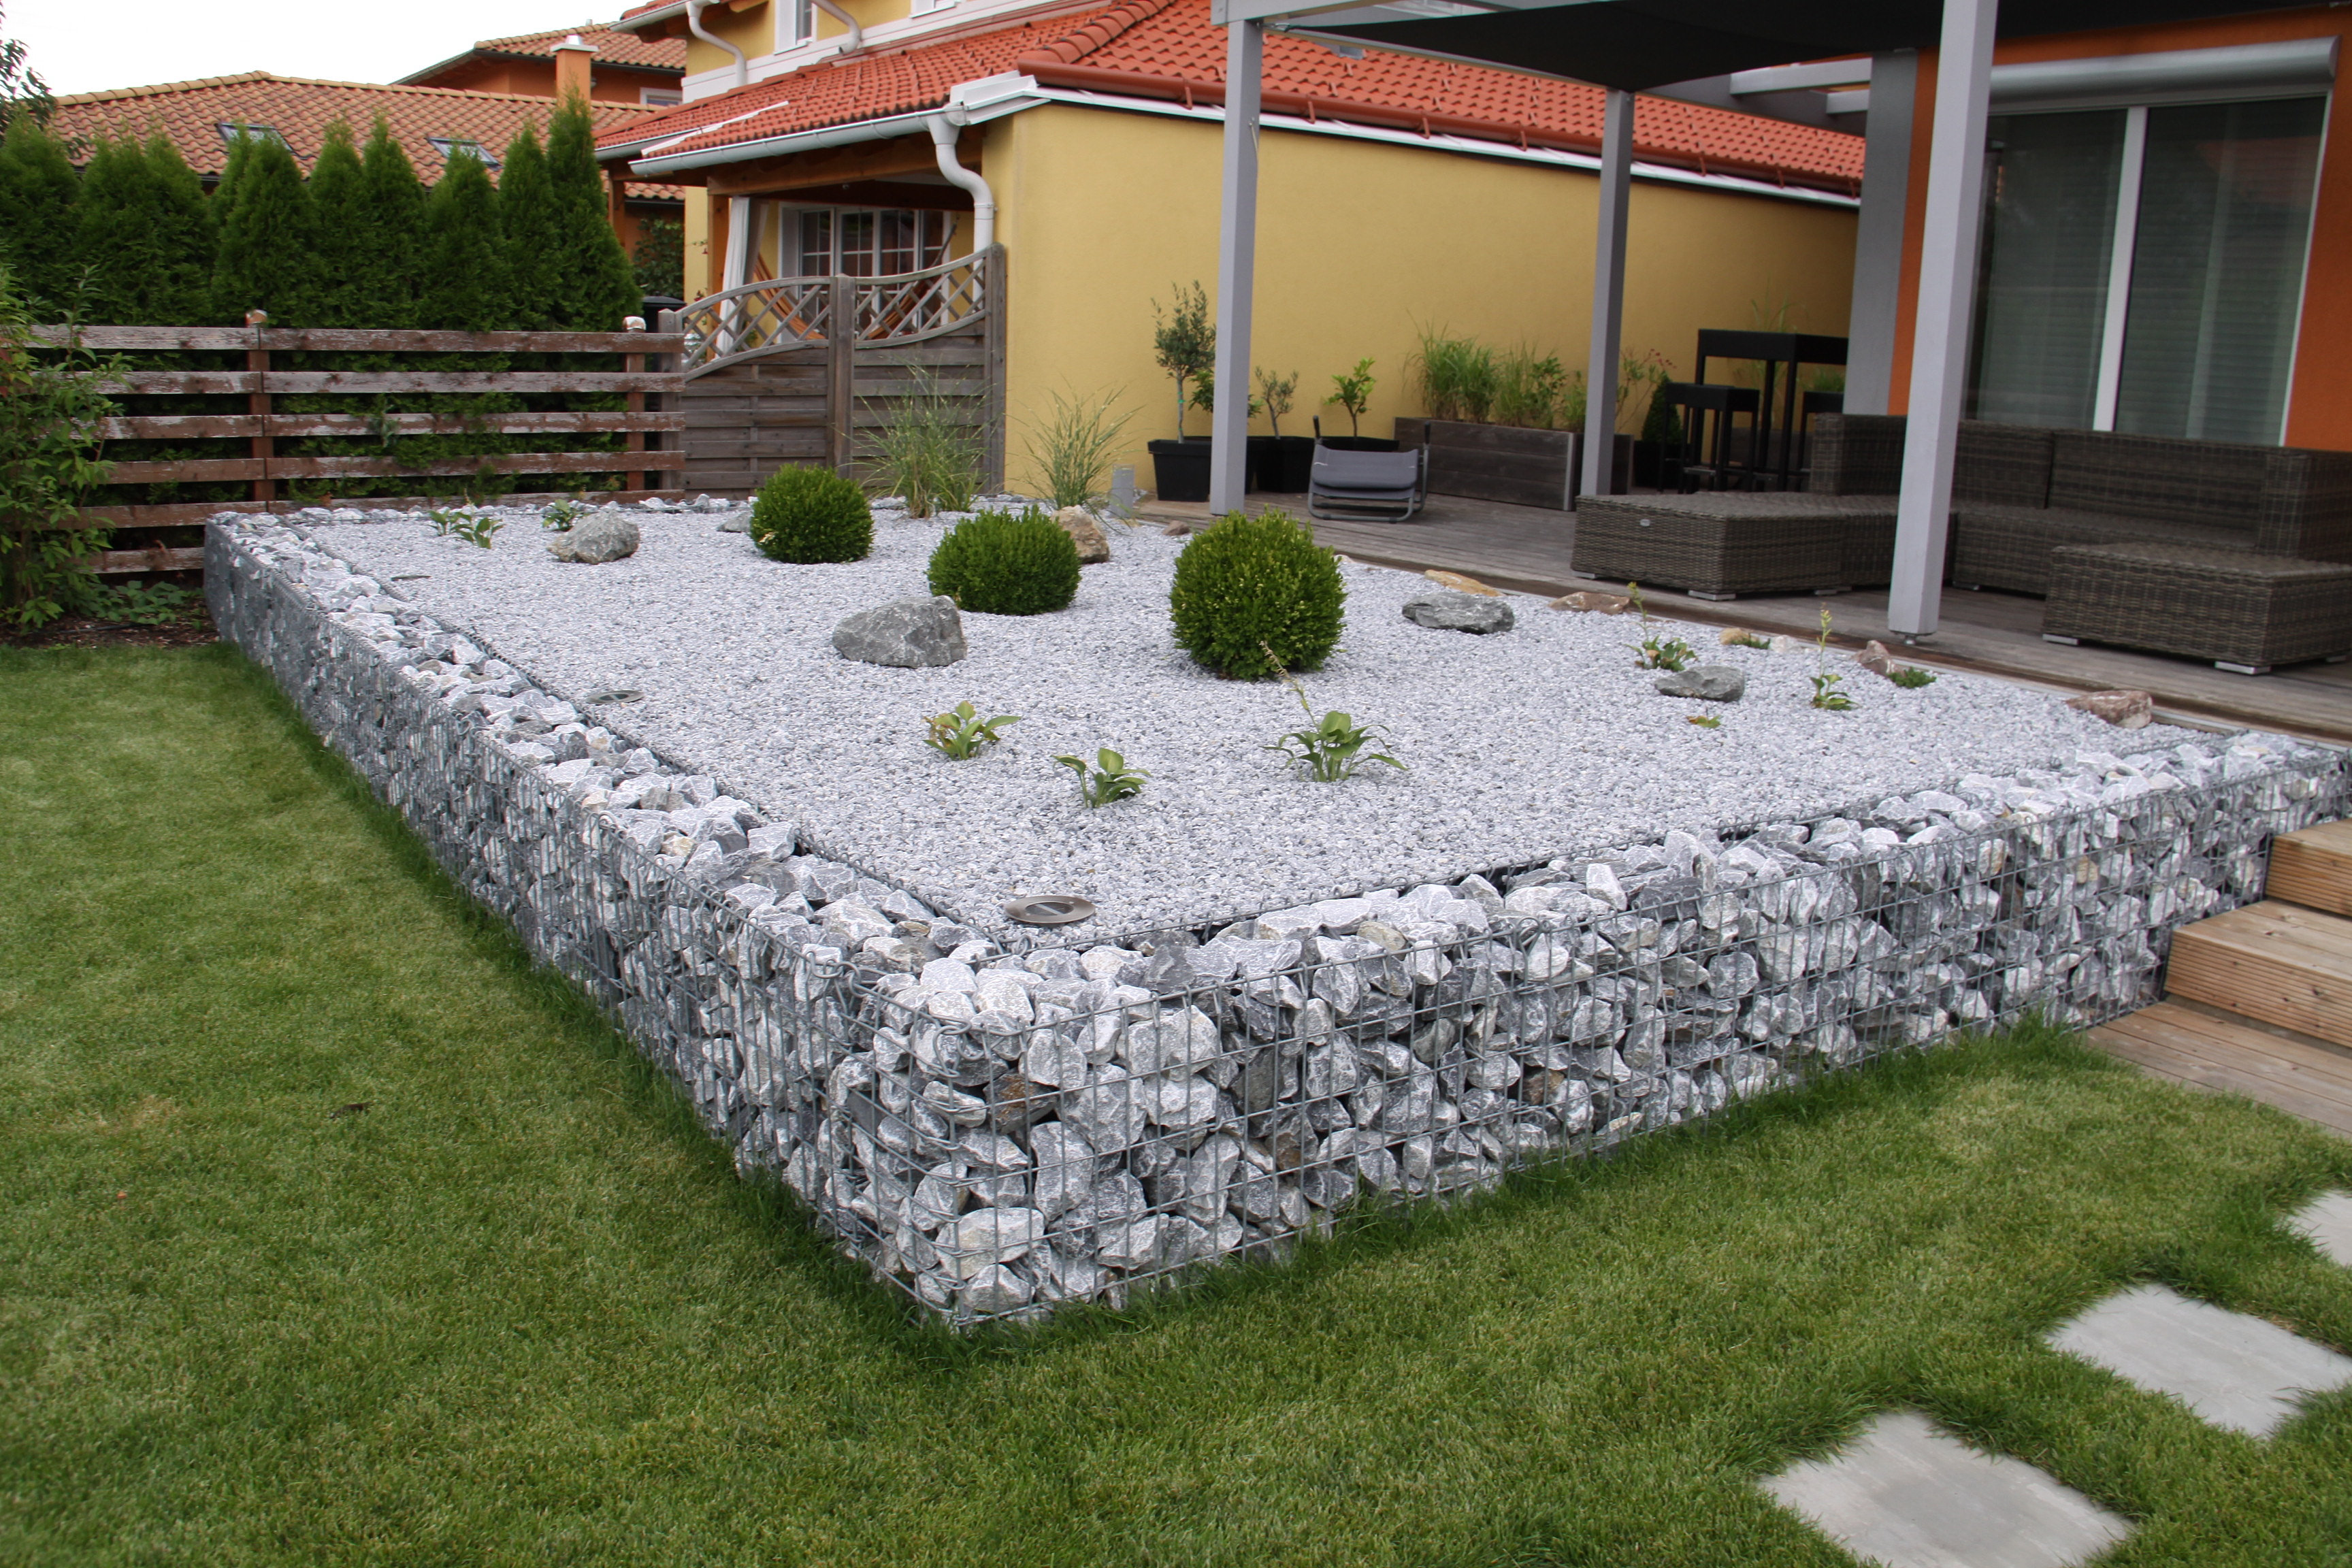 Gartengestaltung peter reinisch kiesbeet mit gabione for Gartengestaltung kiesbeet